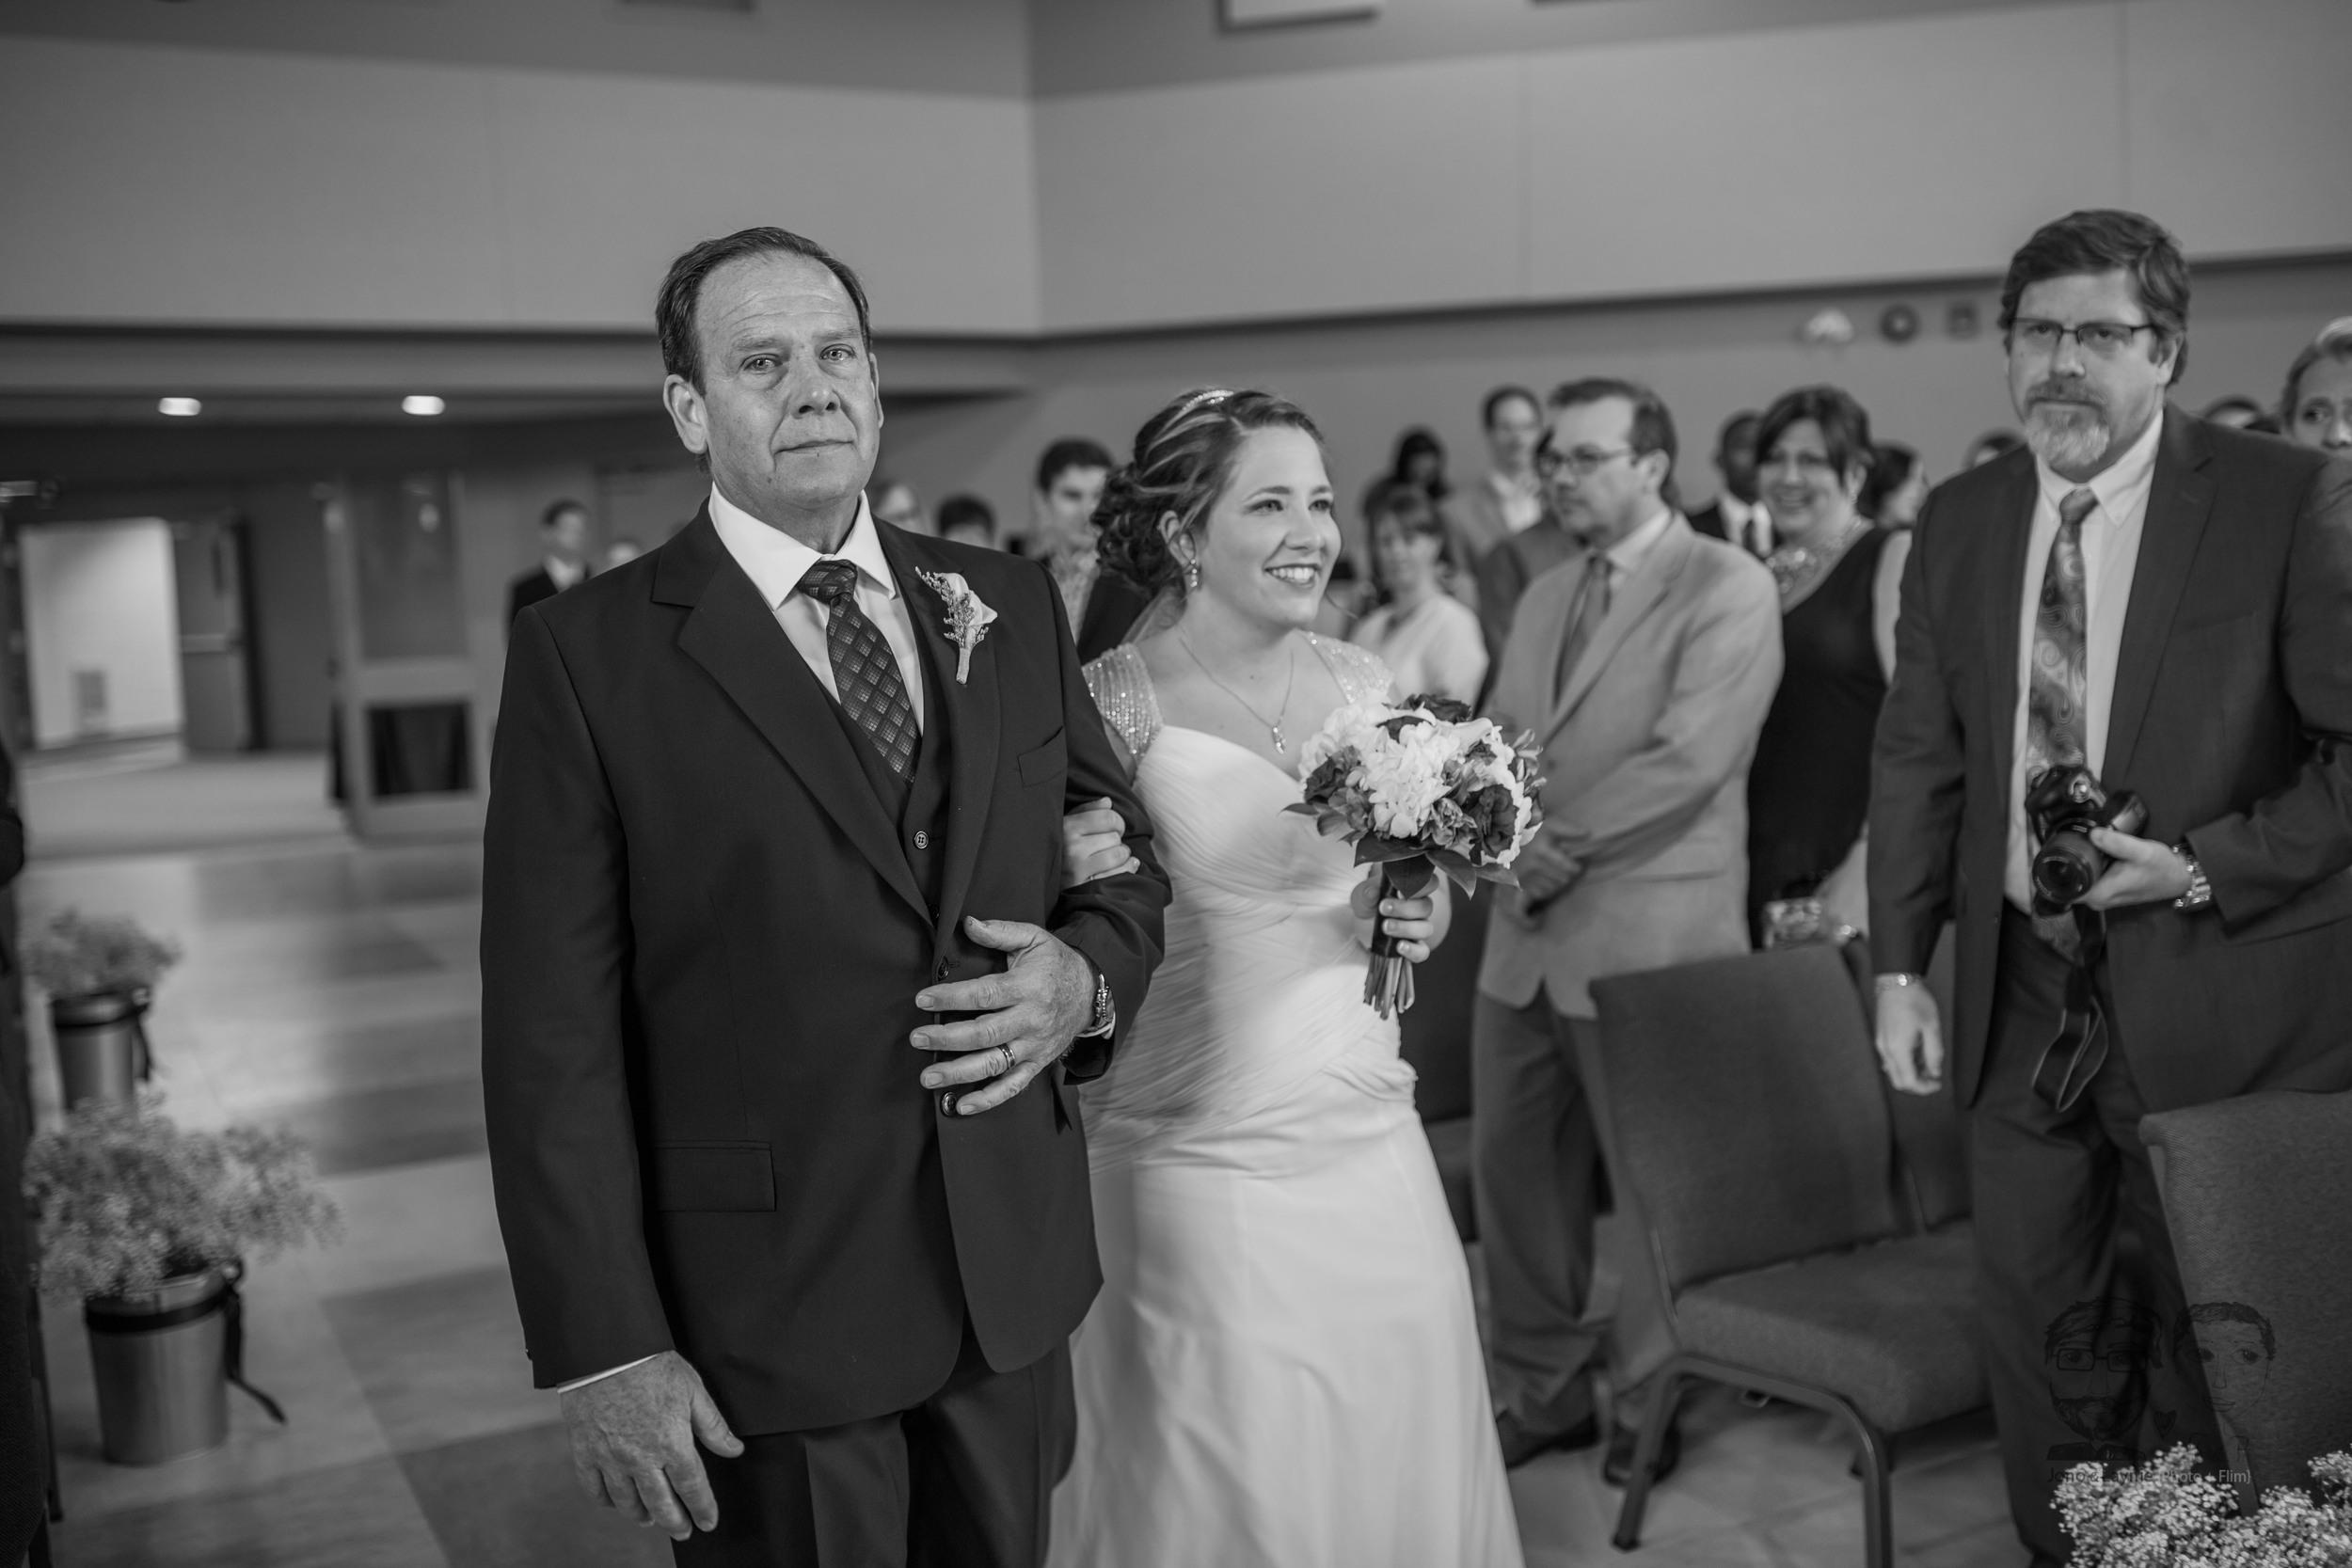 13Toronto Wedding Photographers and Videographers-Jono & Laynie Co.-Orangeville Wedding.jpg